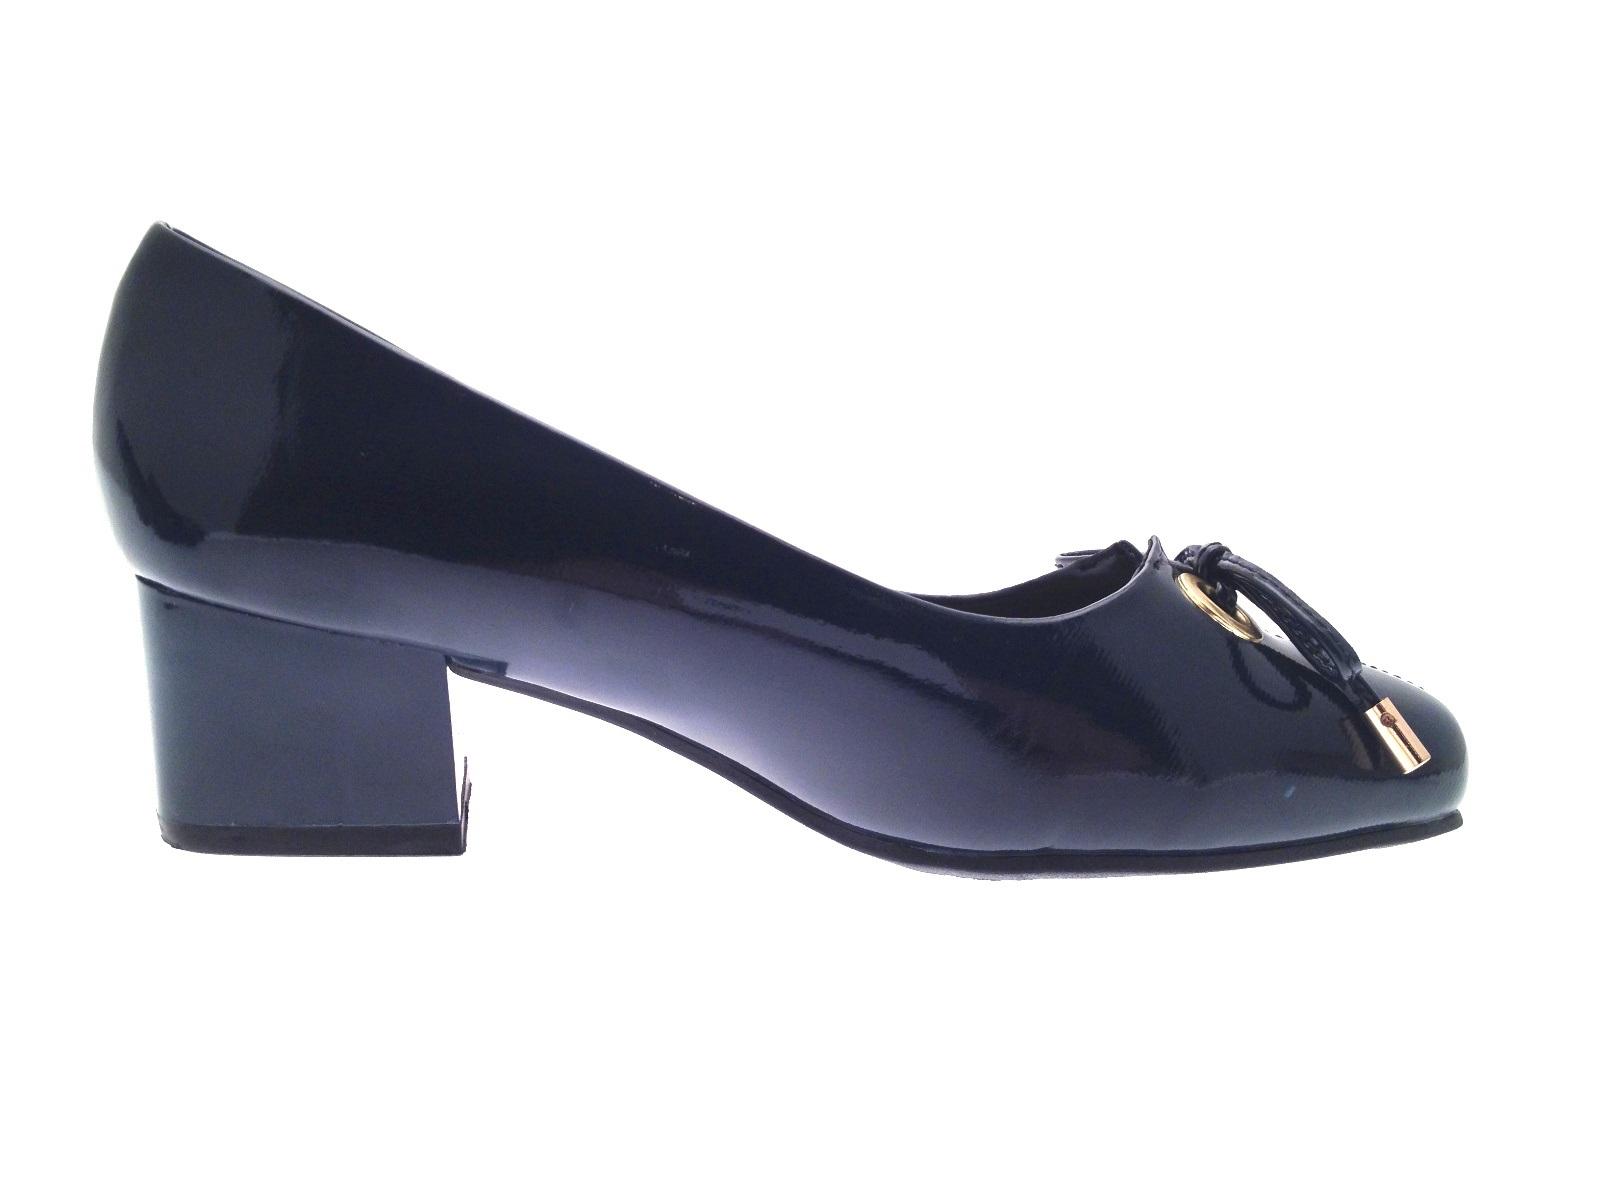 womens patent low block heels wide fit comfort court shoes